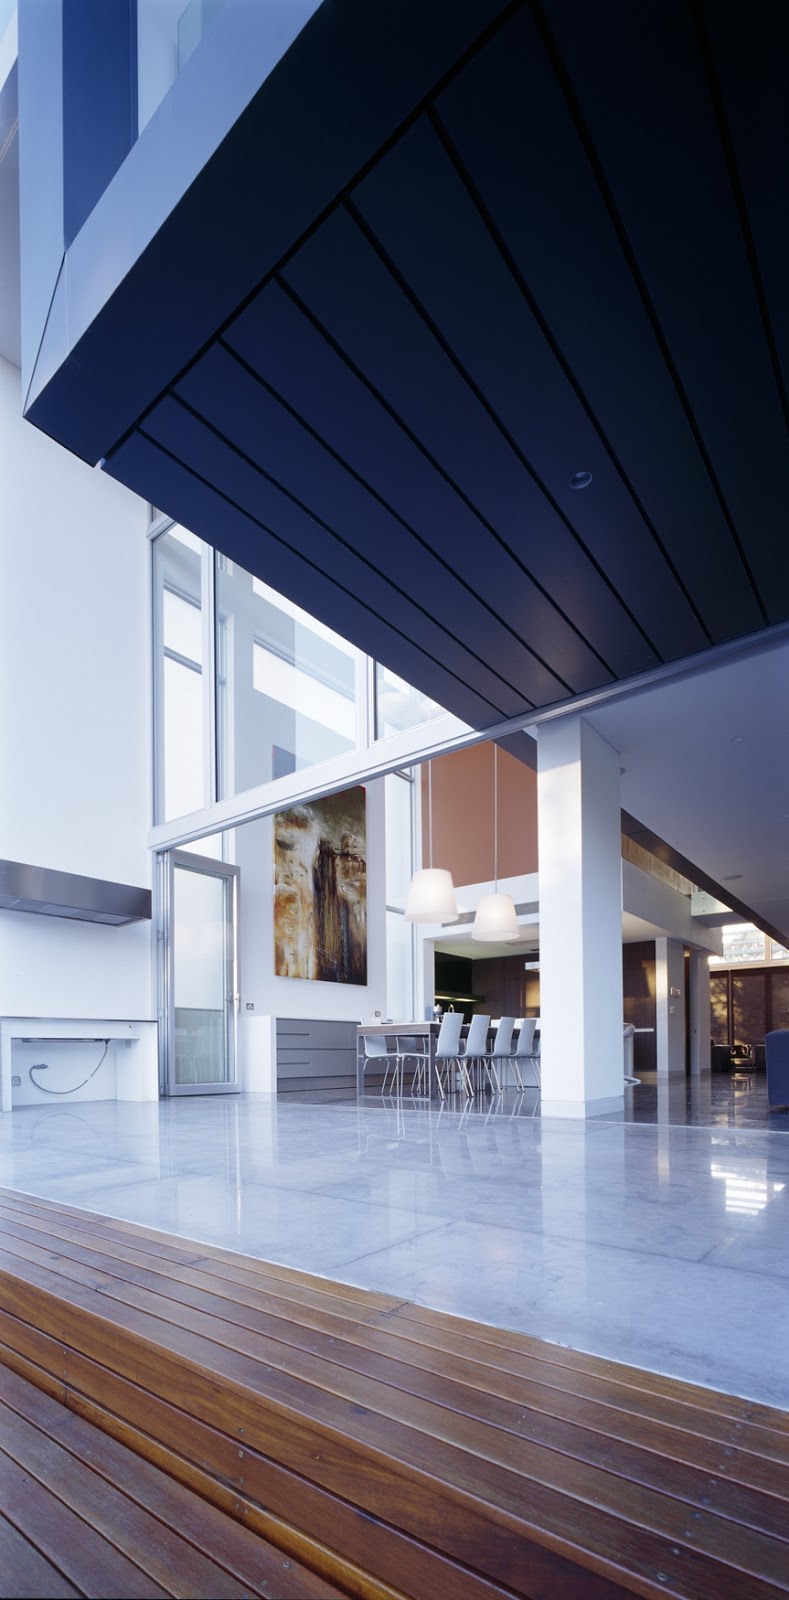 kitchen table bench seat cabinets white minosa: sensory interior delight by minosa